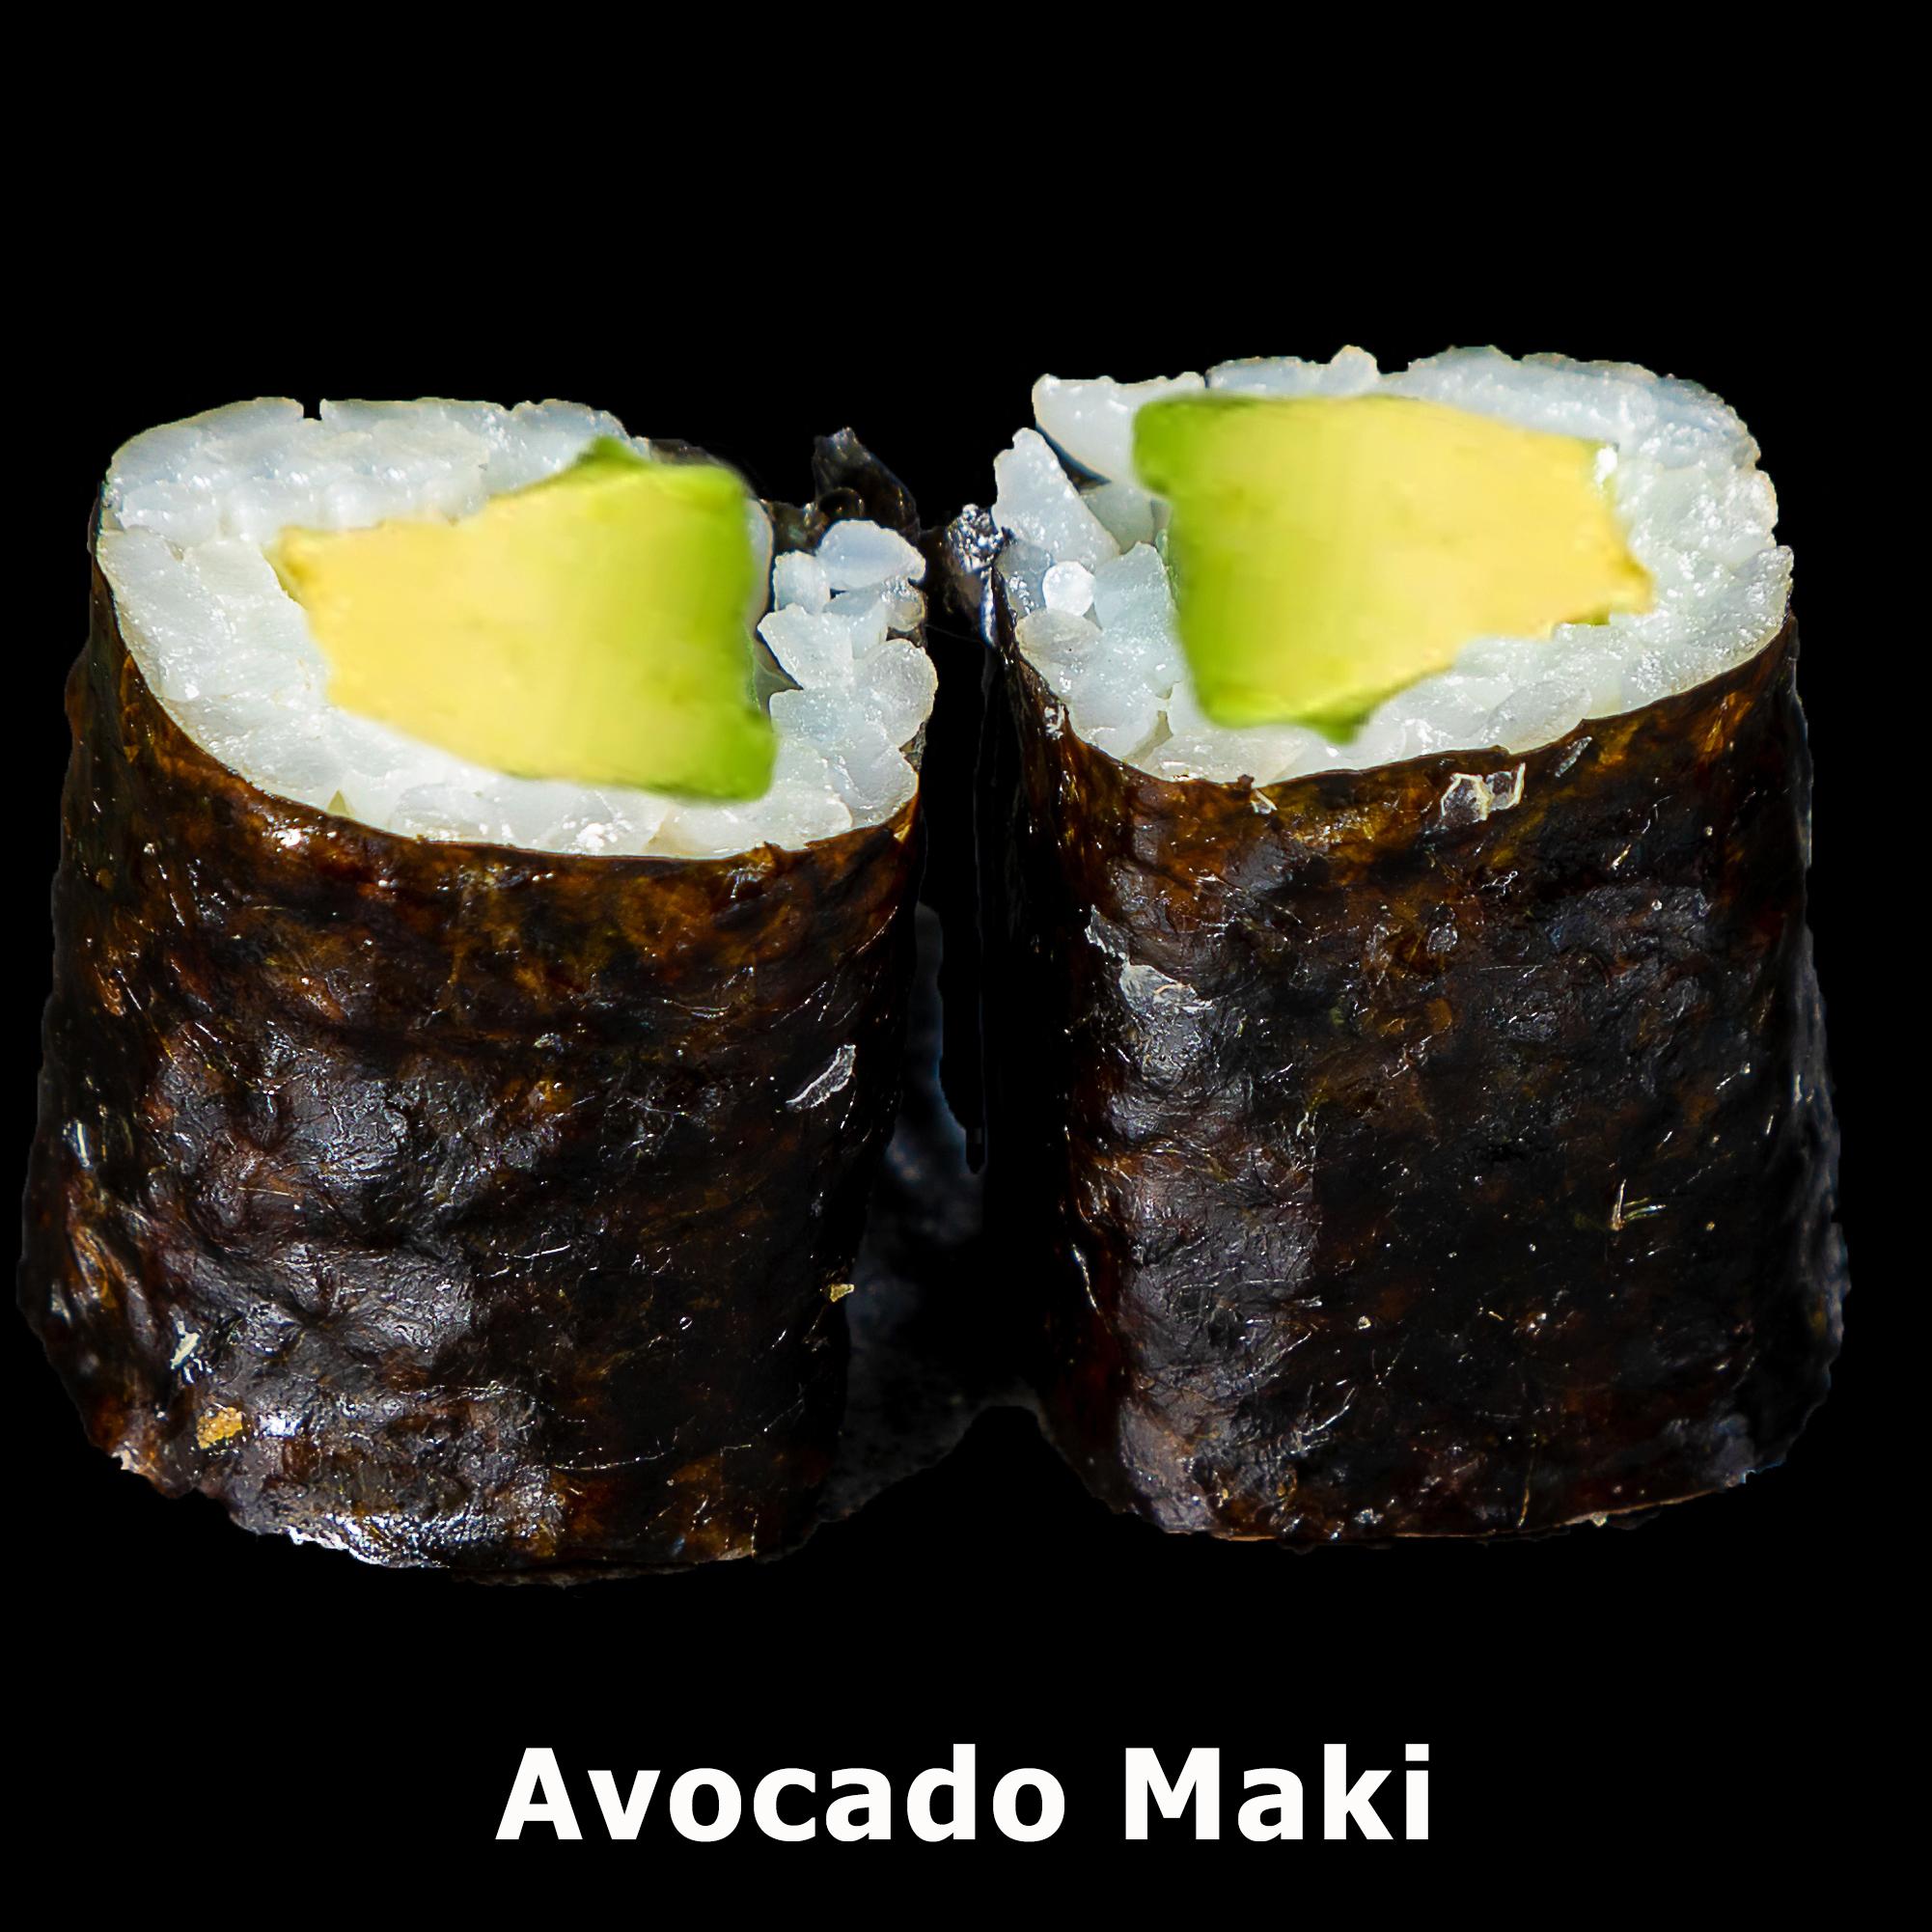 21. Avocado Maki